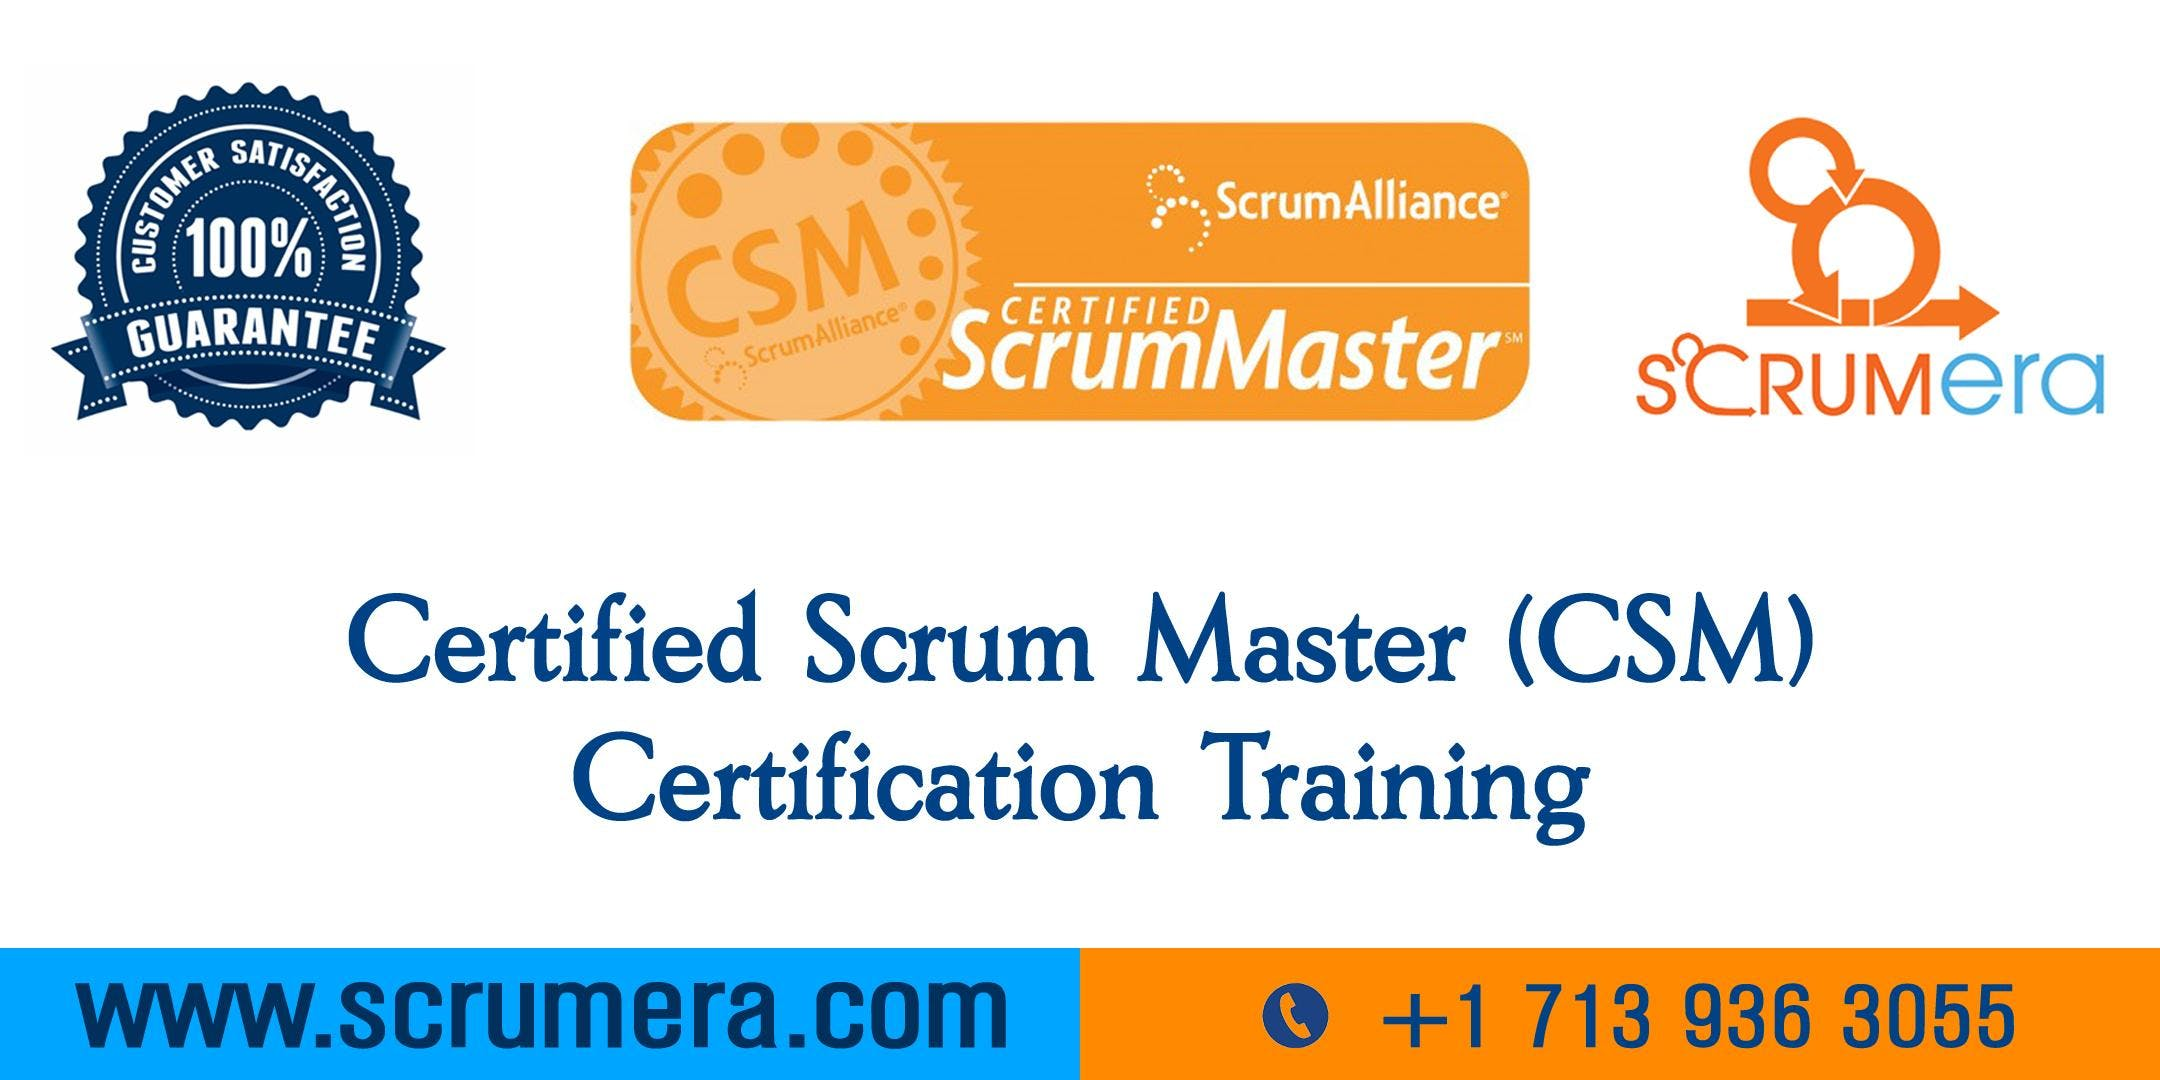 Scrum Master Certification | CSM Training | CSM Certification Workshop | Certified Scrum Master (CSM) Training in Boise, ID | ScrumERA